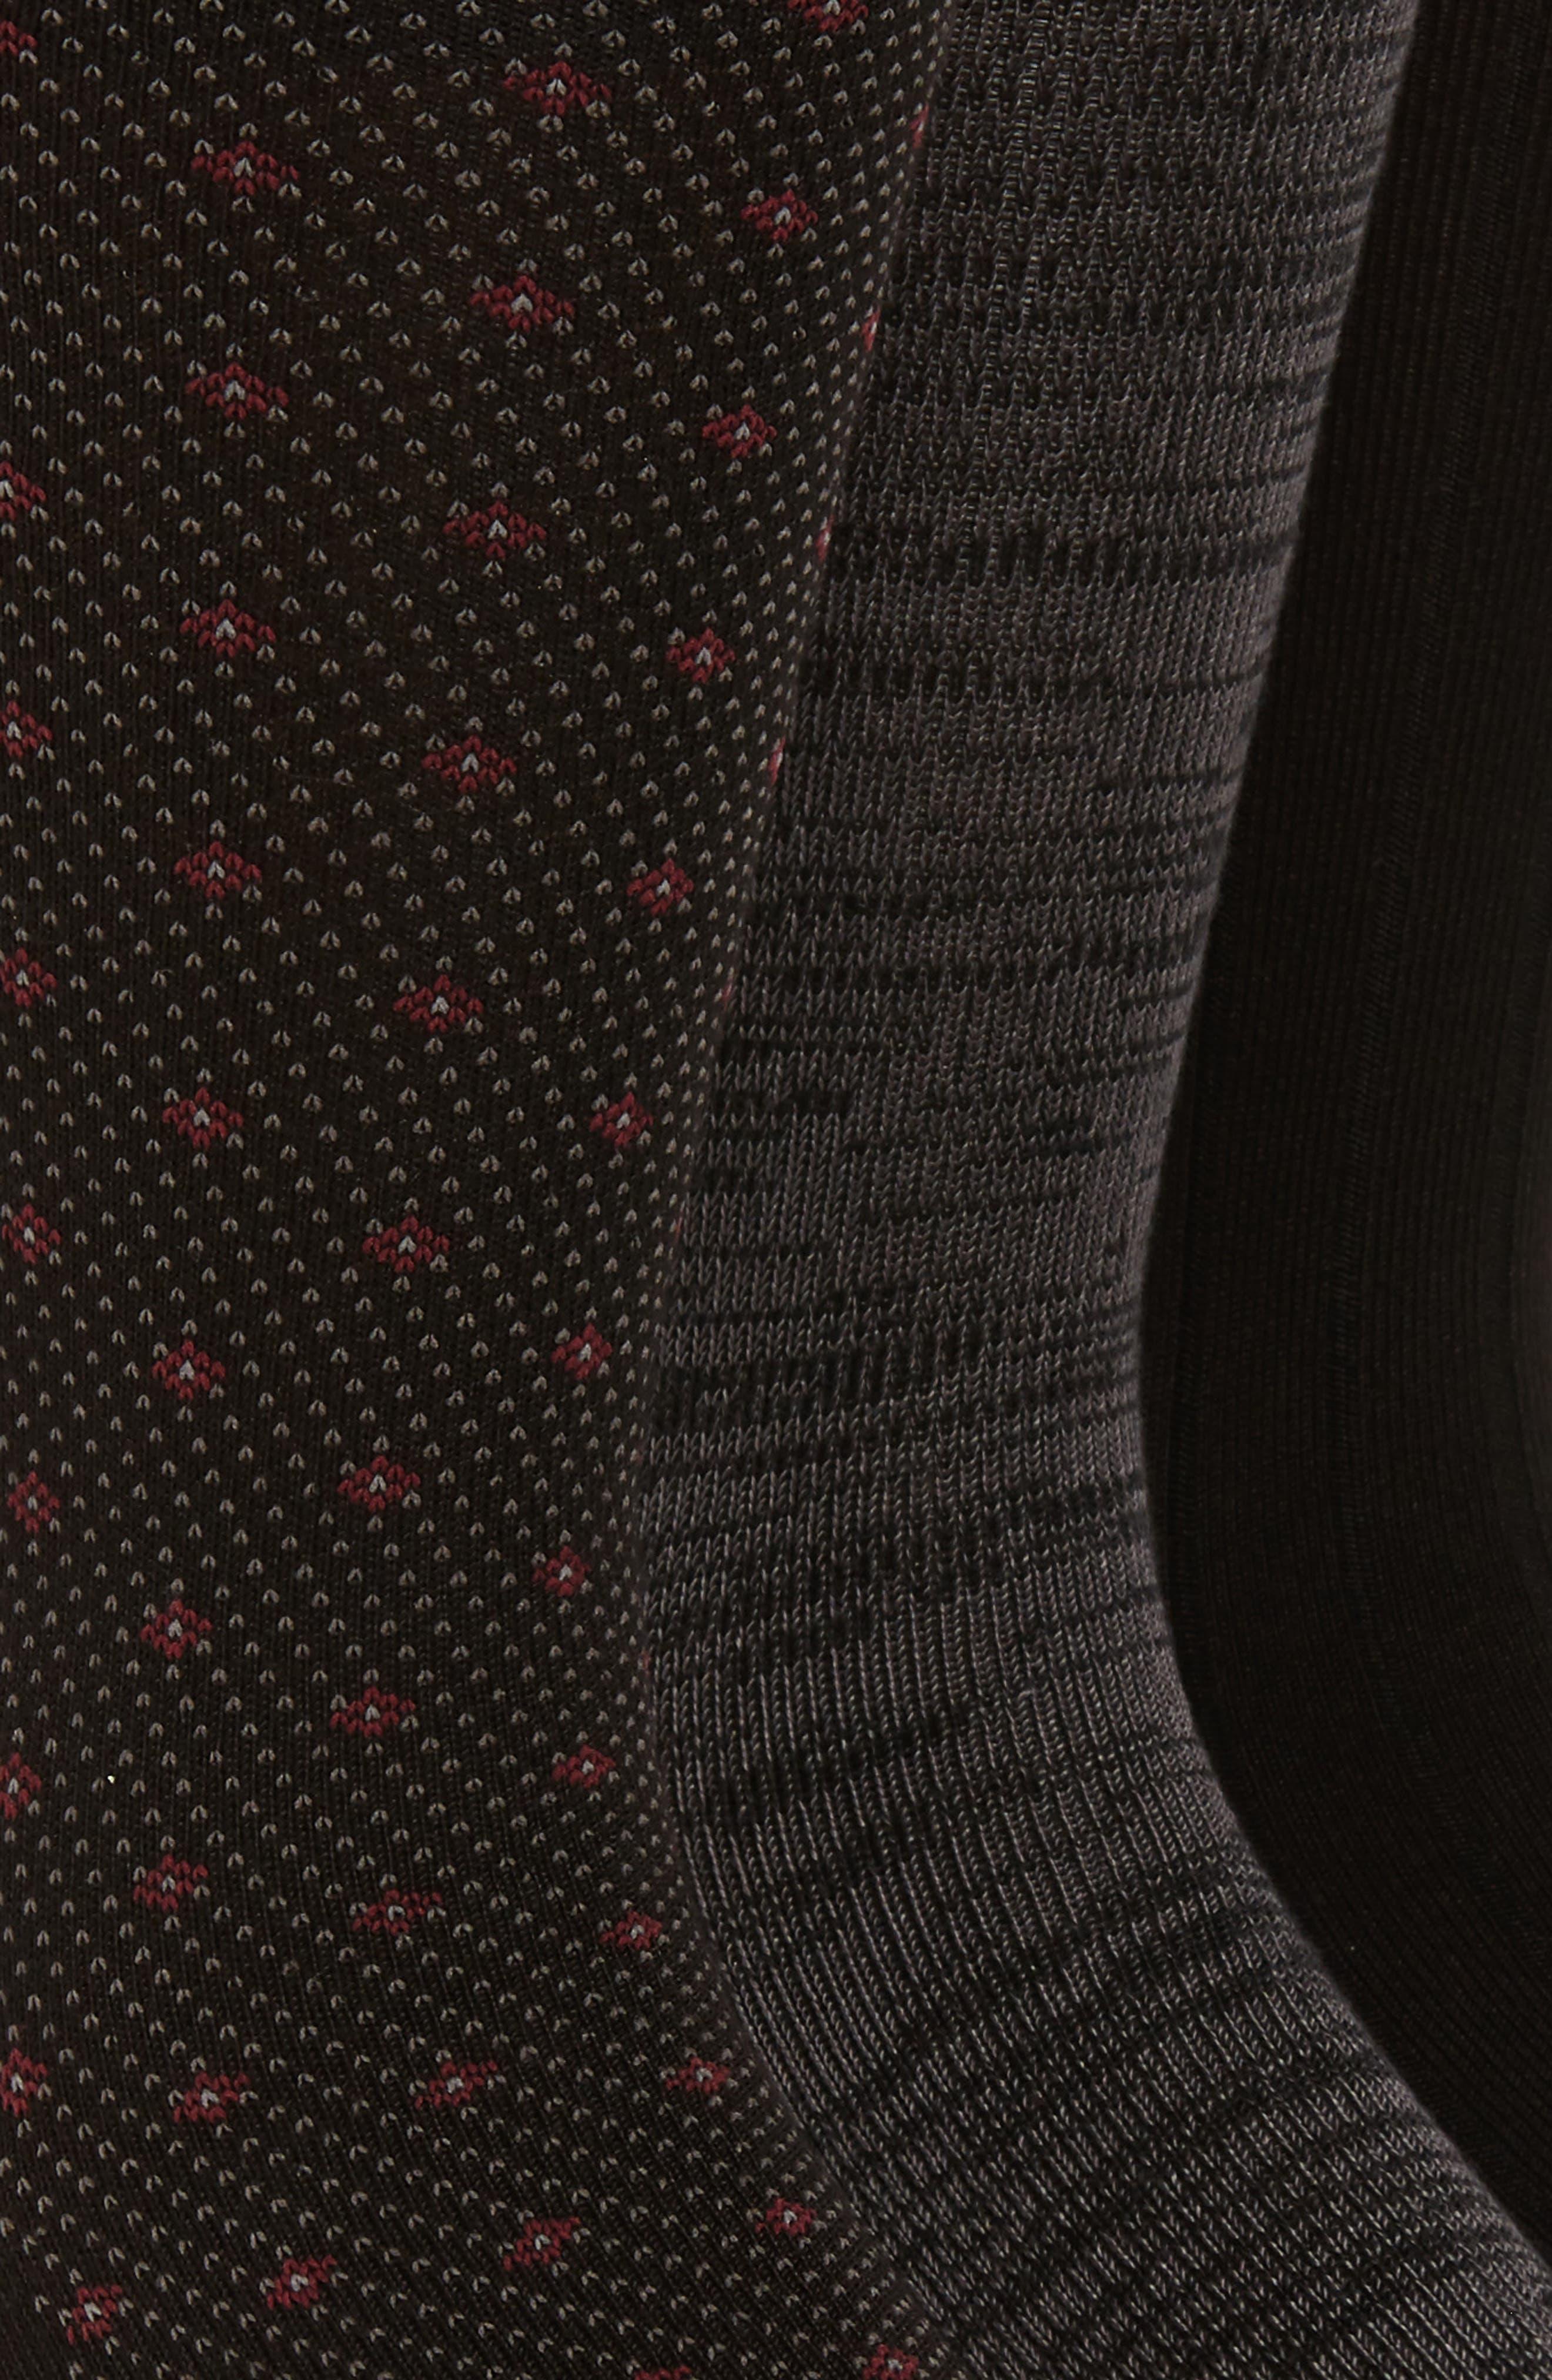 Supersoft Diamond Dot Assorted 3-Pack Socks,                             Alternate thumbnail 2, color,                             BLACK